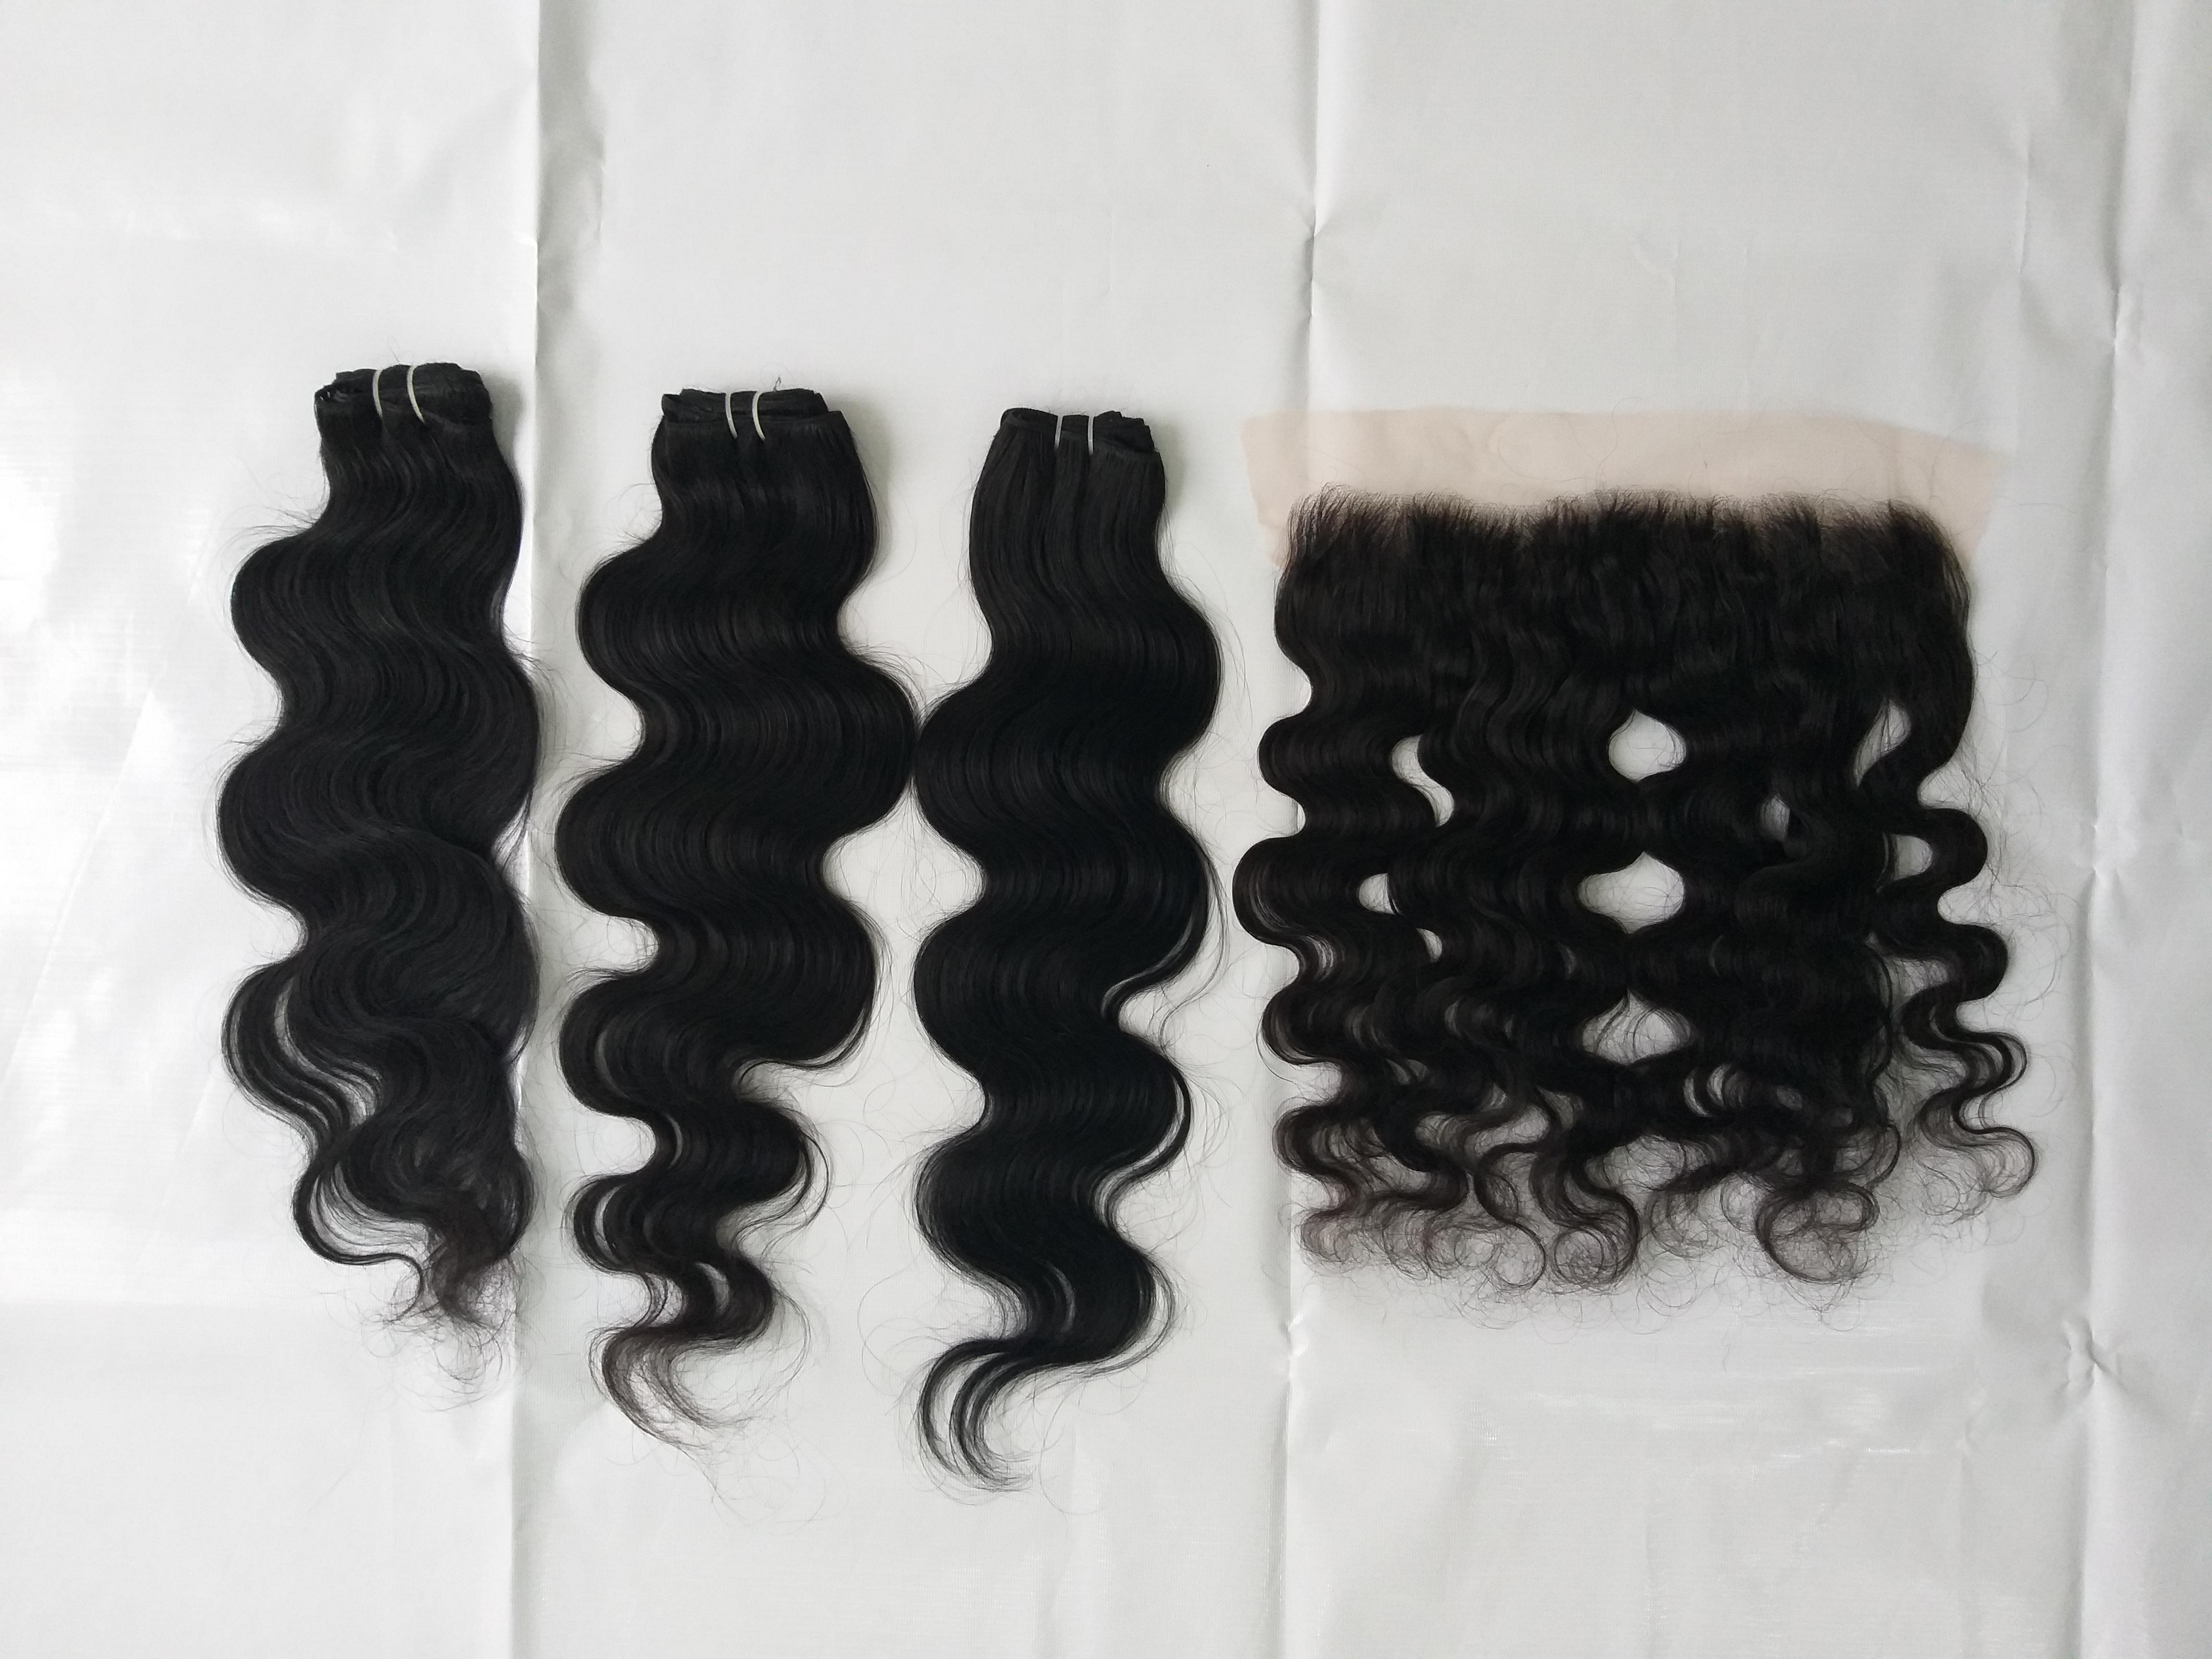 Natural Raw Body Wave Human Hair Extension